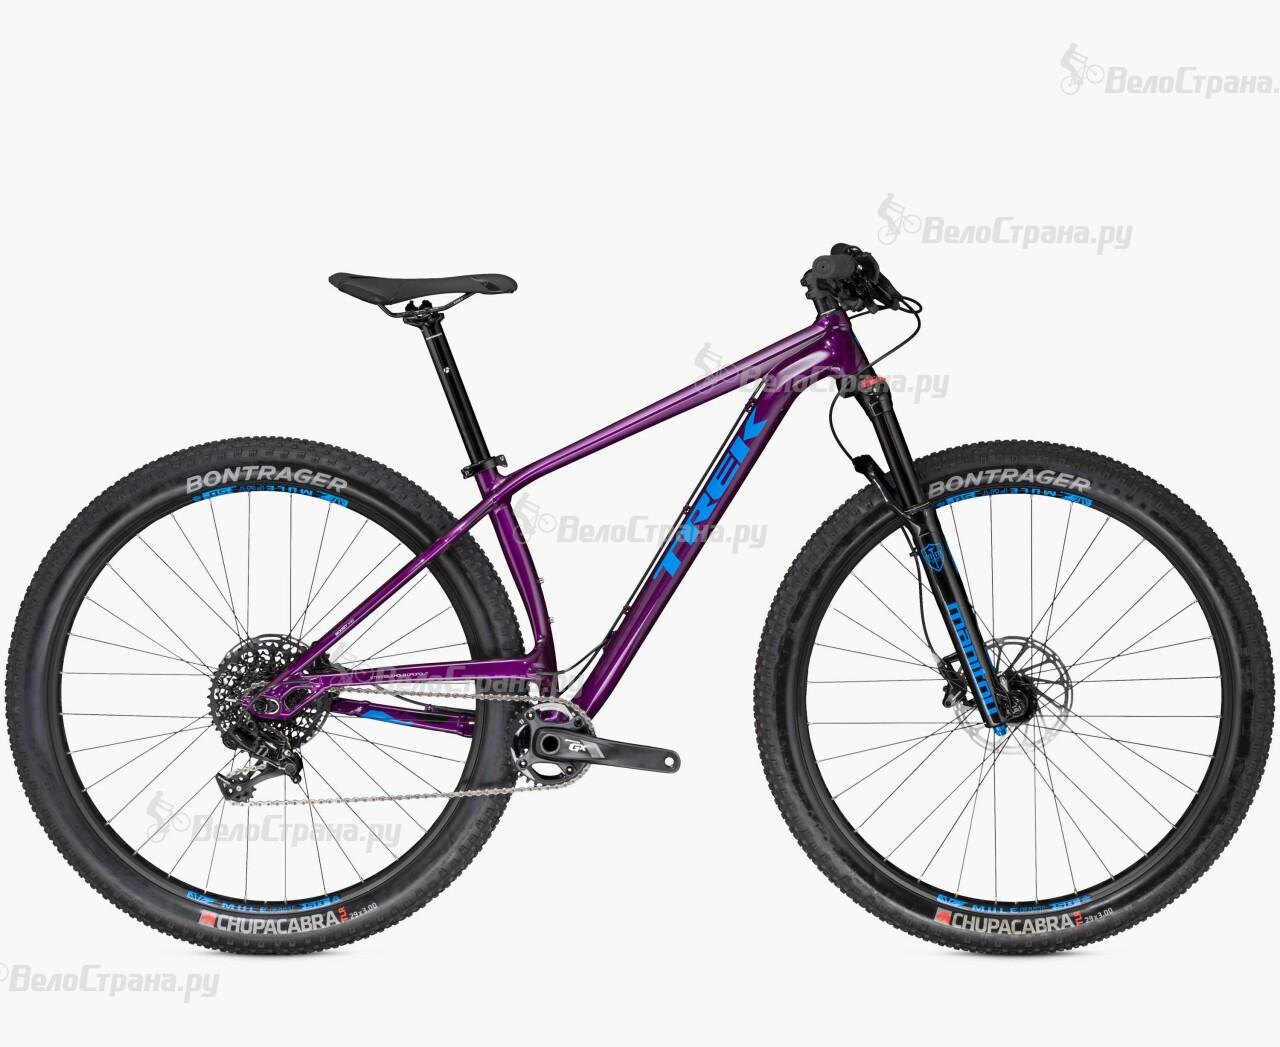 Велосипед Trek Stache 7 29+ (2016) trek stache 7 2014